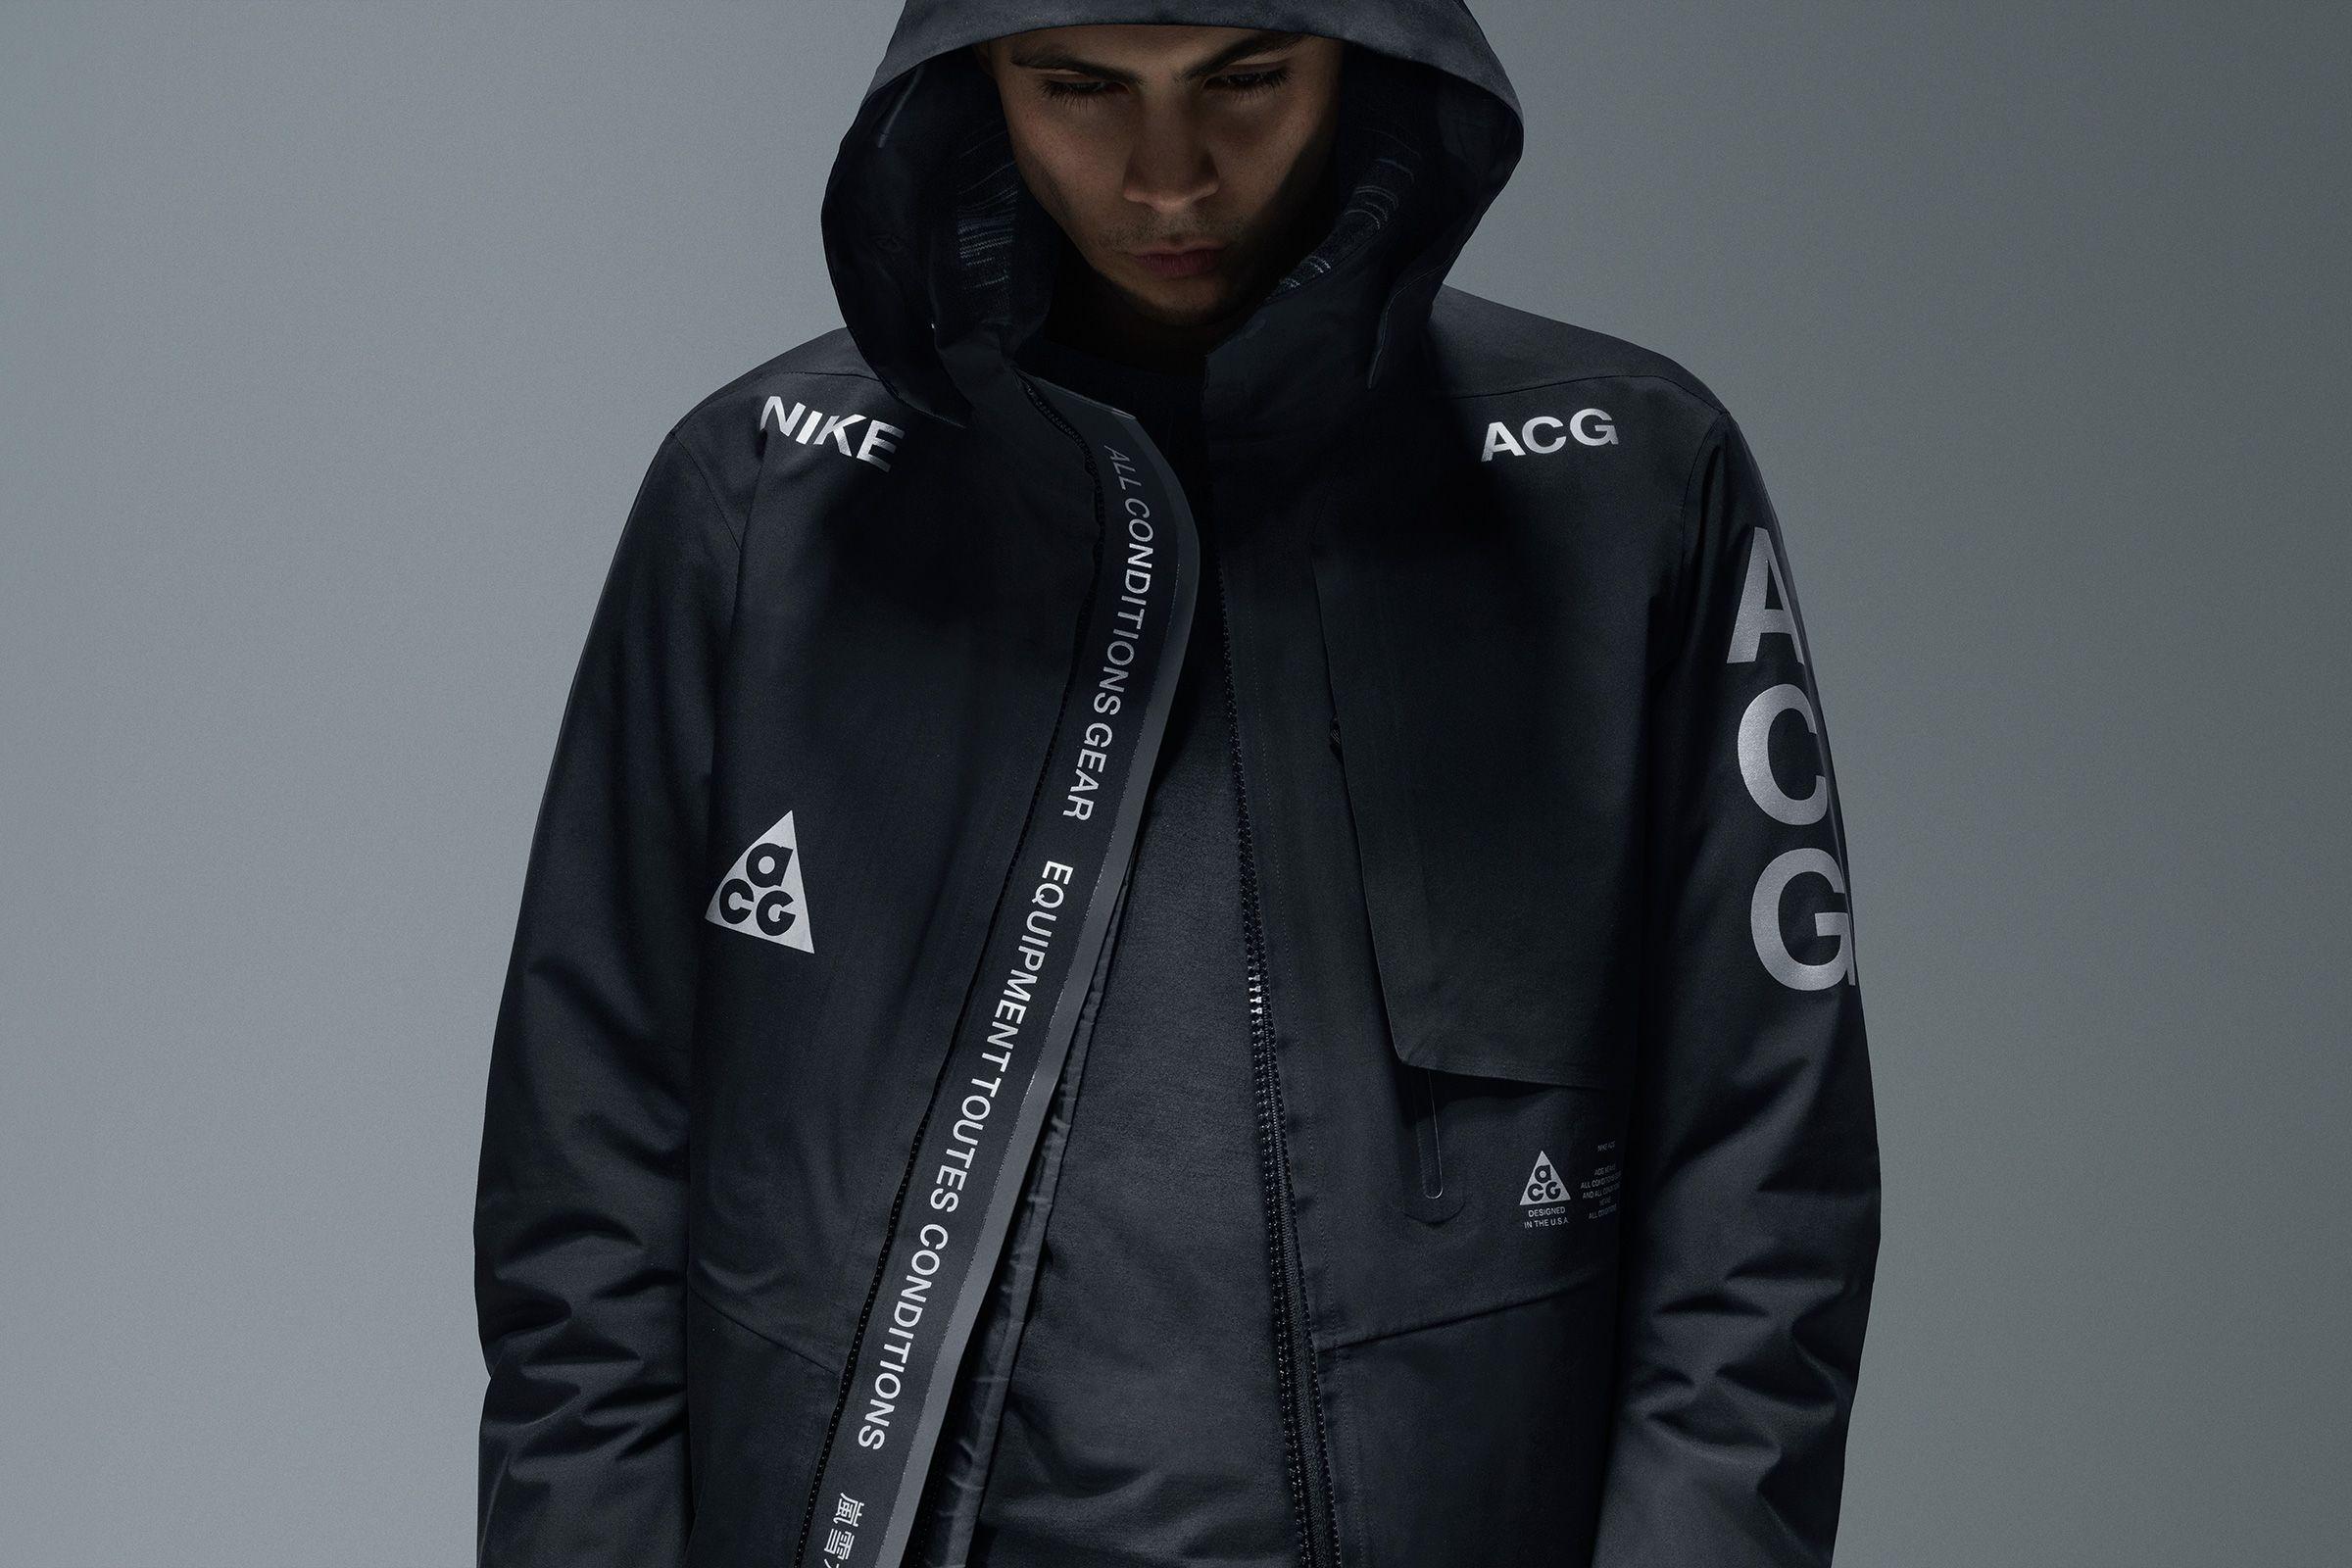 Nikelab ACG 2014 | Nike acg, Nike, Marques streetwear